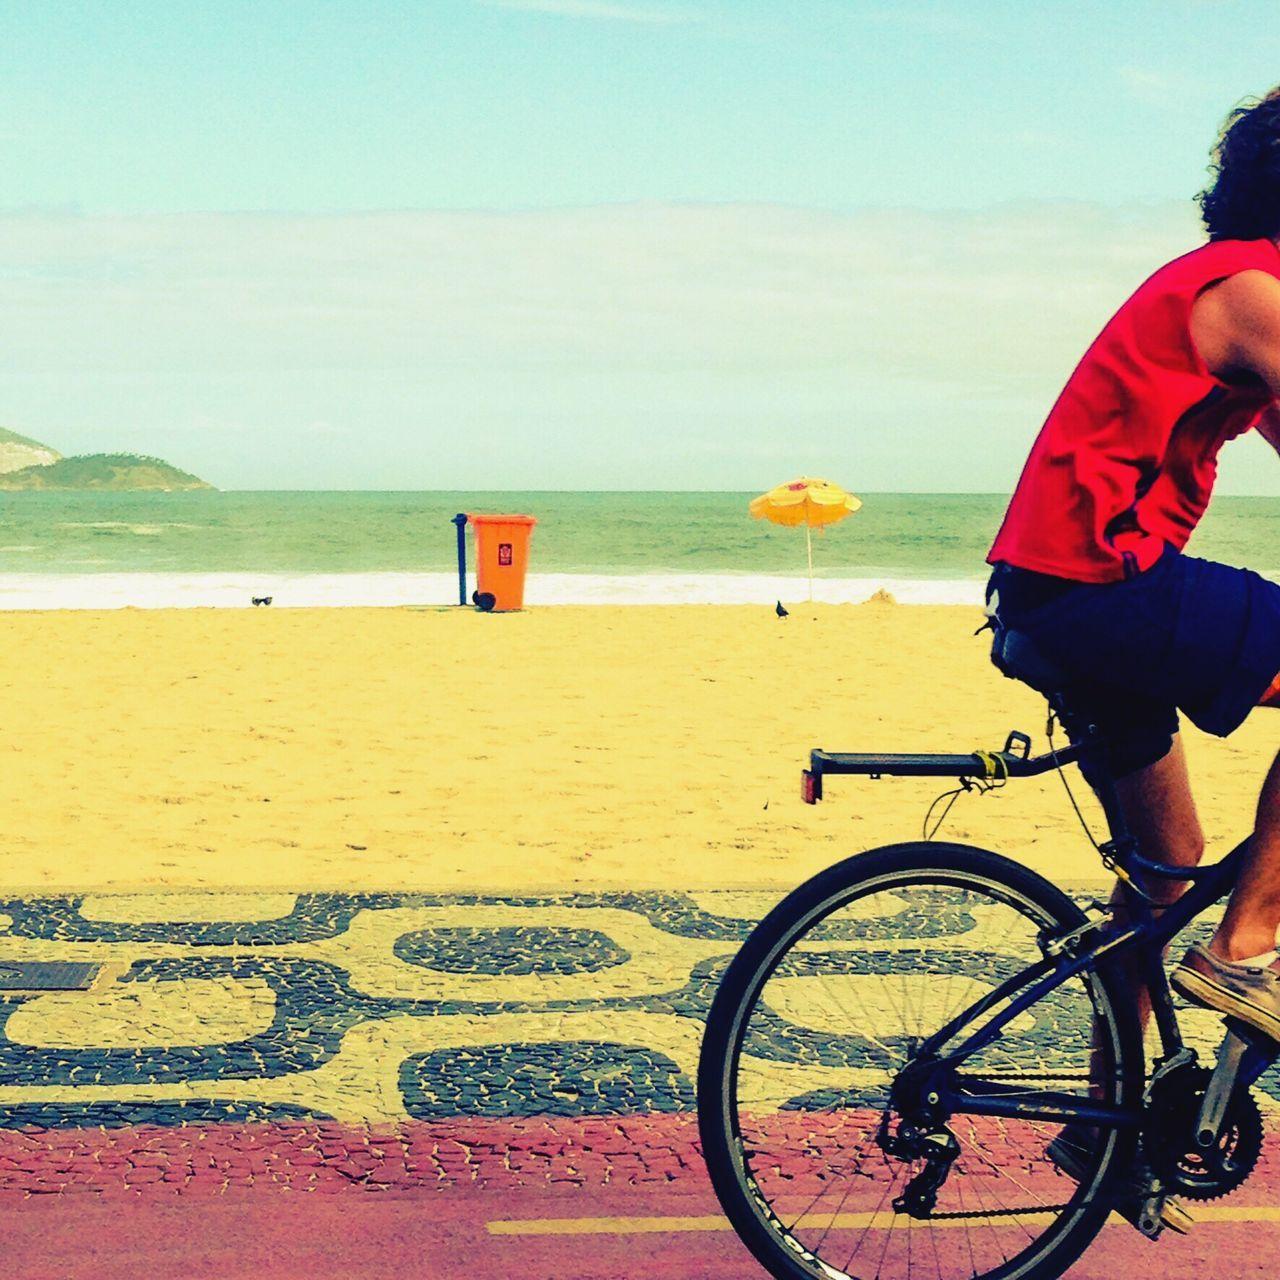 CyclingUnites Bicycle Beach Real People Lifestyles Ipanema Beach Rio De Janeiro Biker Transportation IPhoneography